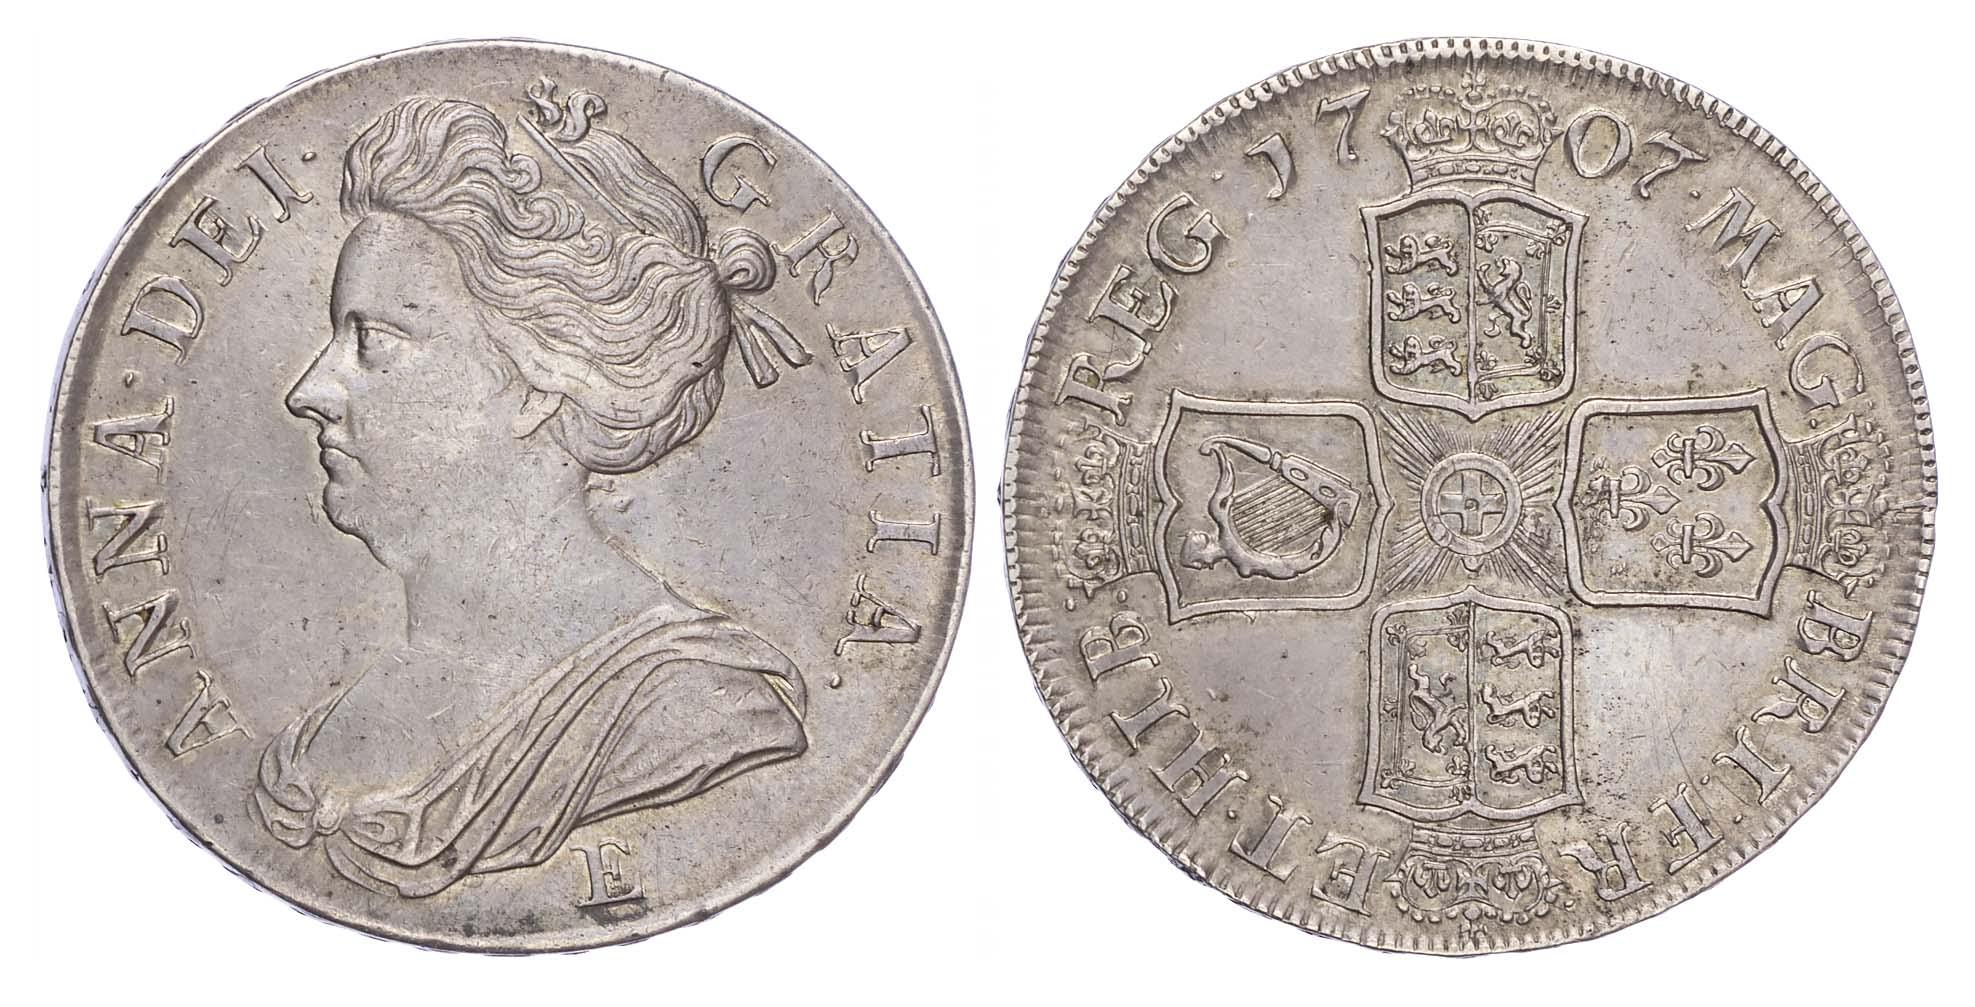 Anne (1702-14), Crown, 1707, E (Edinburgh) below, Sexto edge